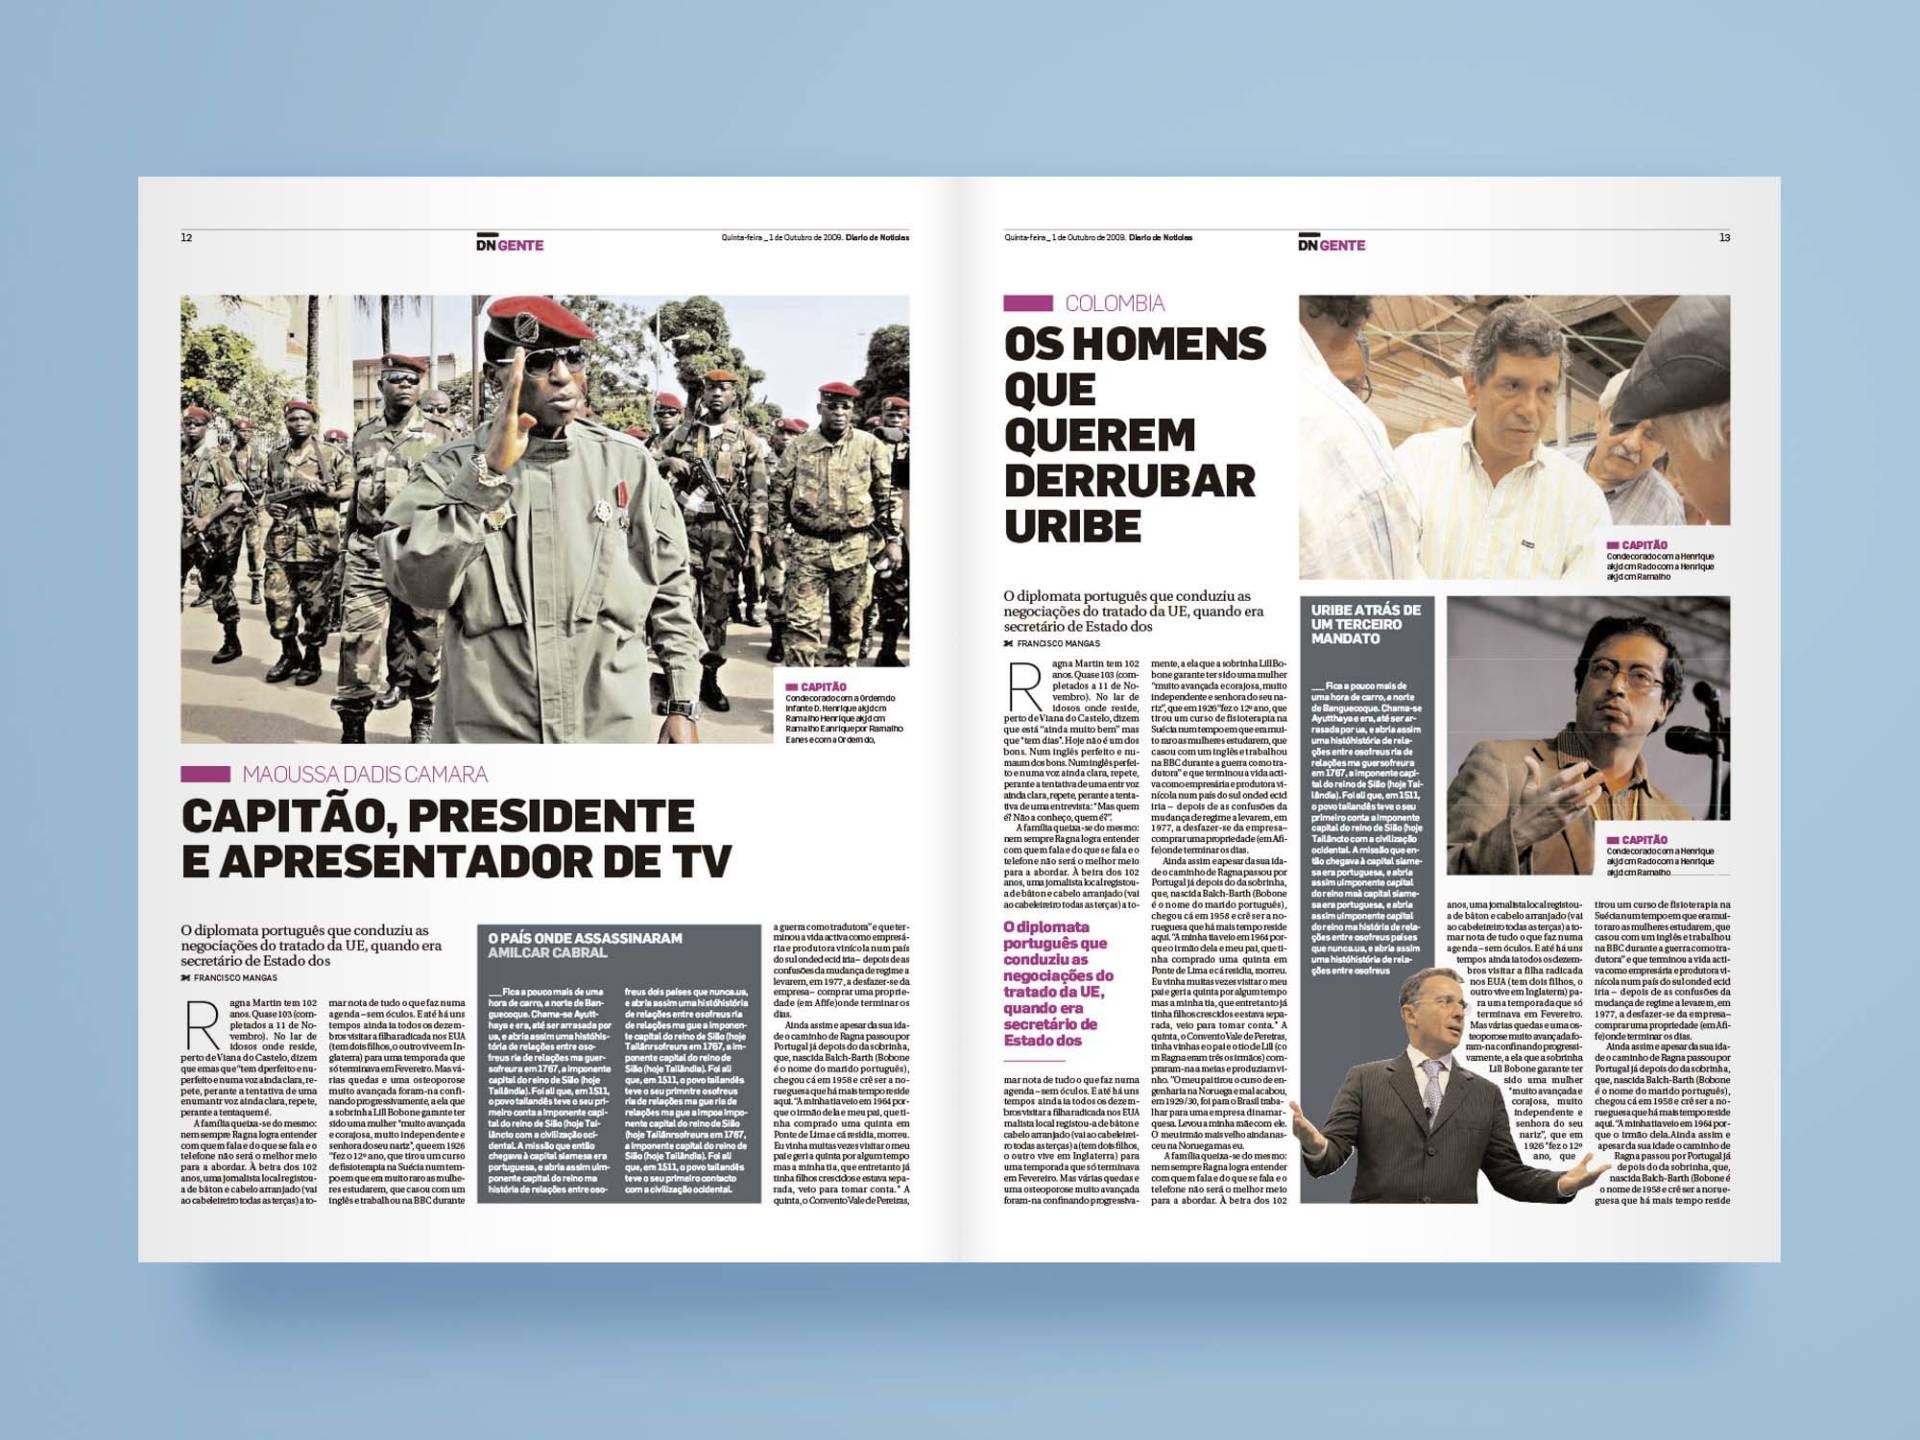 Diario_De_Noticias_07_Wenceslau_News_Design